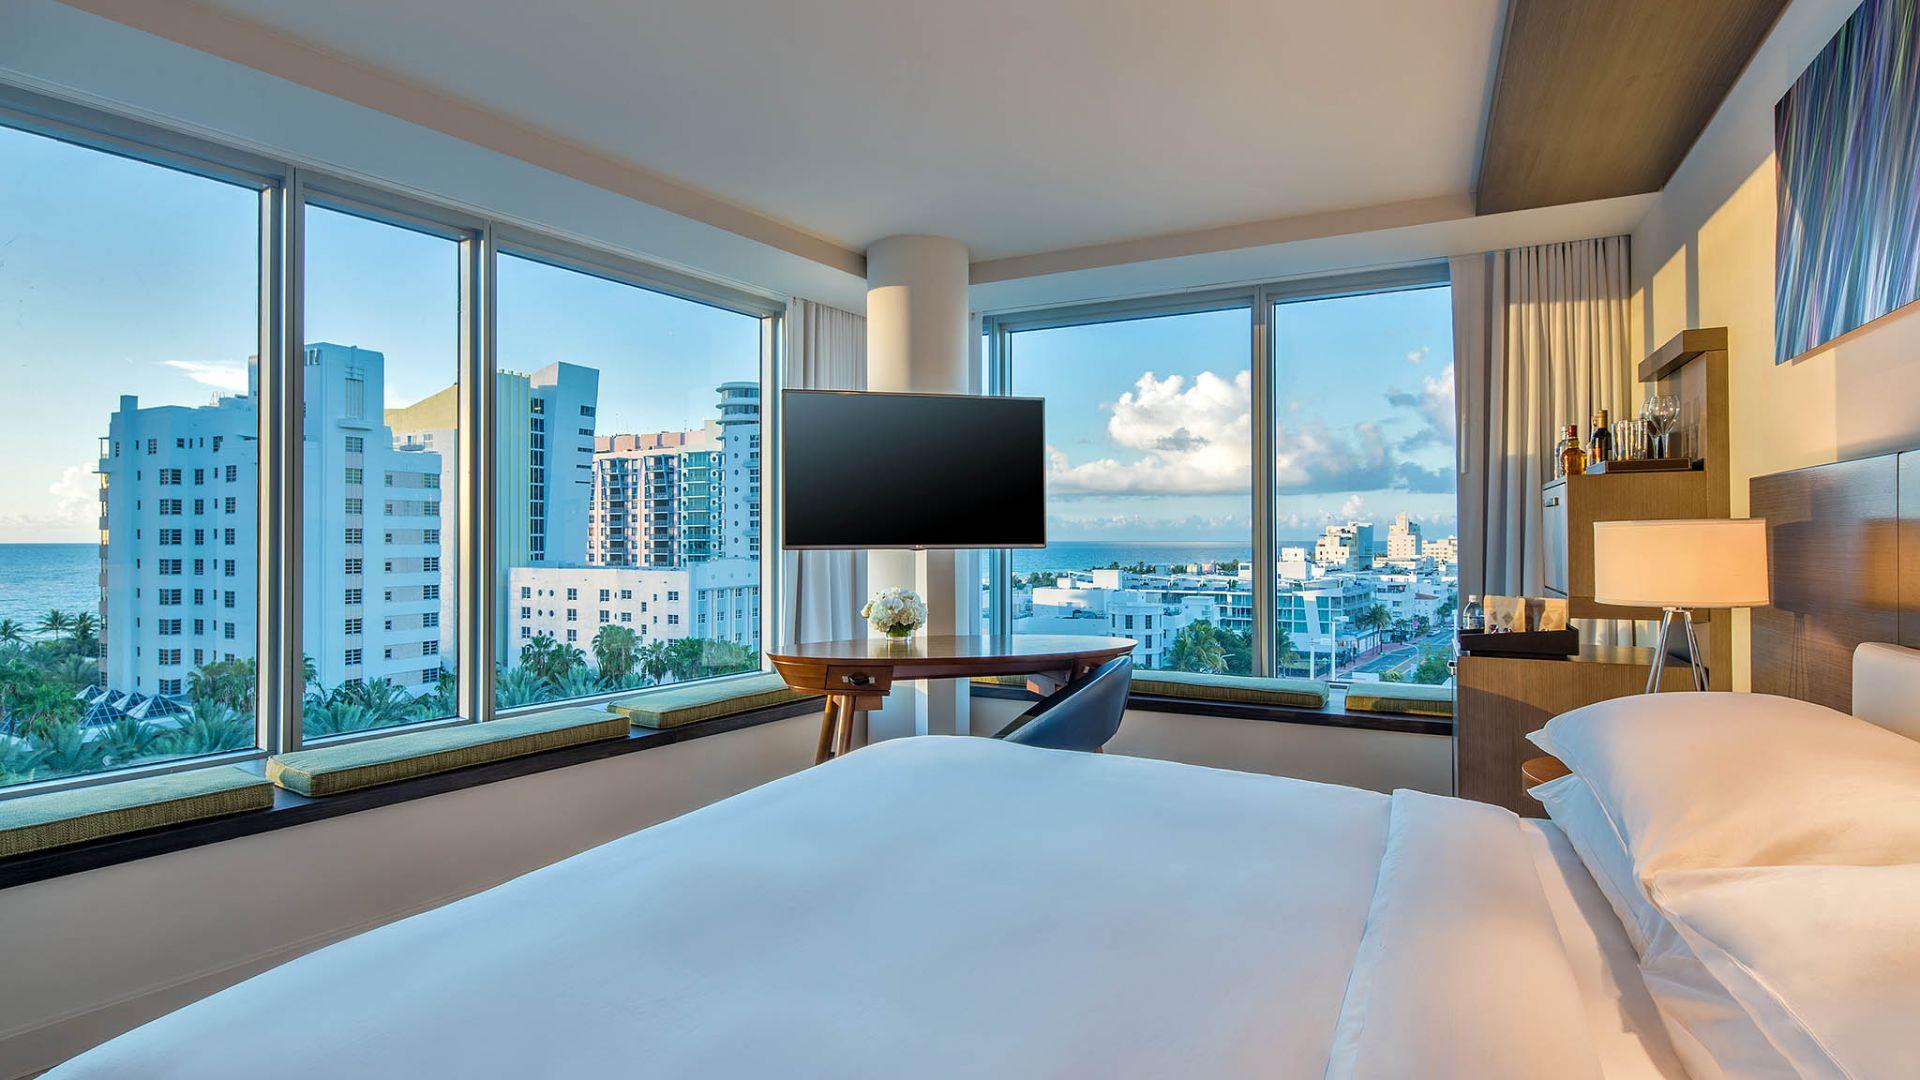 Luxury Hotels and Luxury Resorts | Visa Signature Luxury Hotel ...